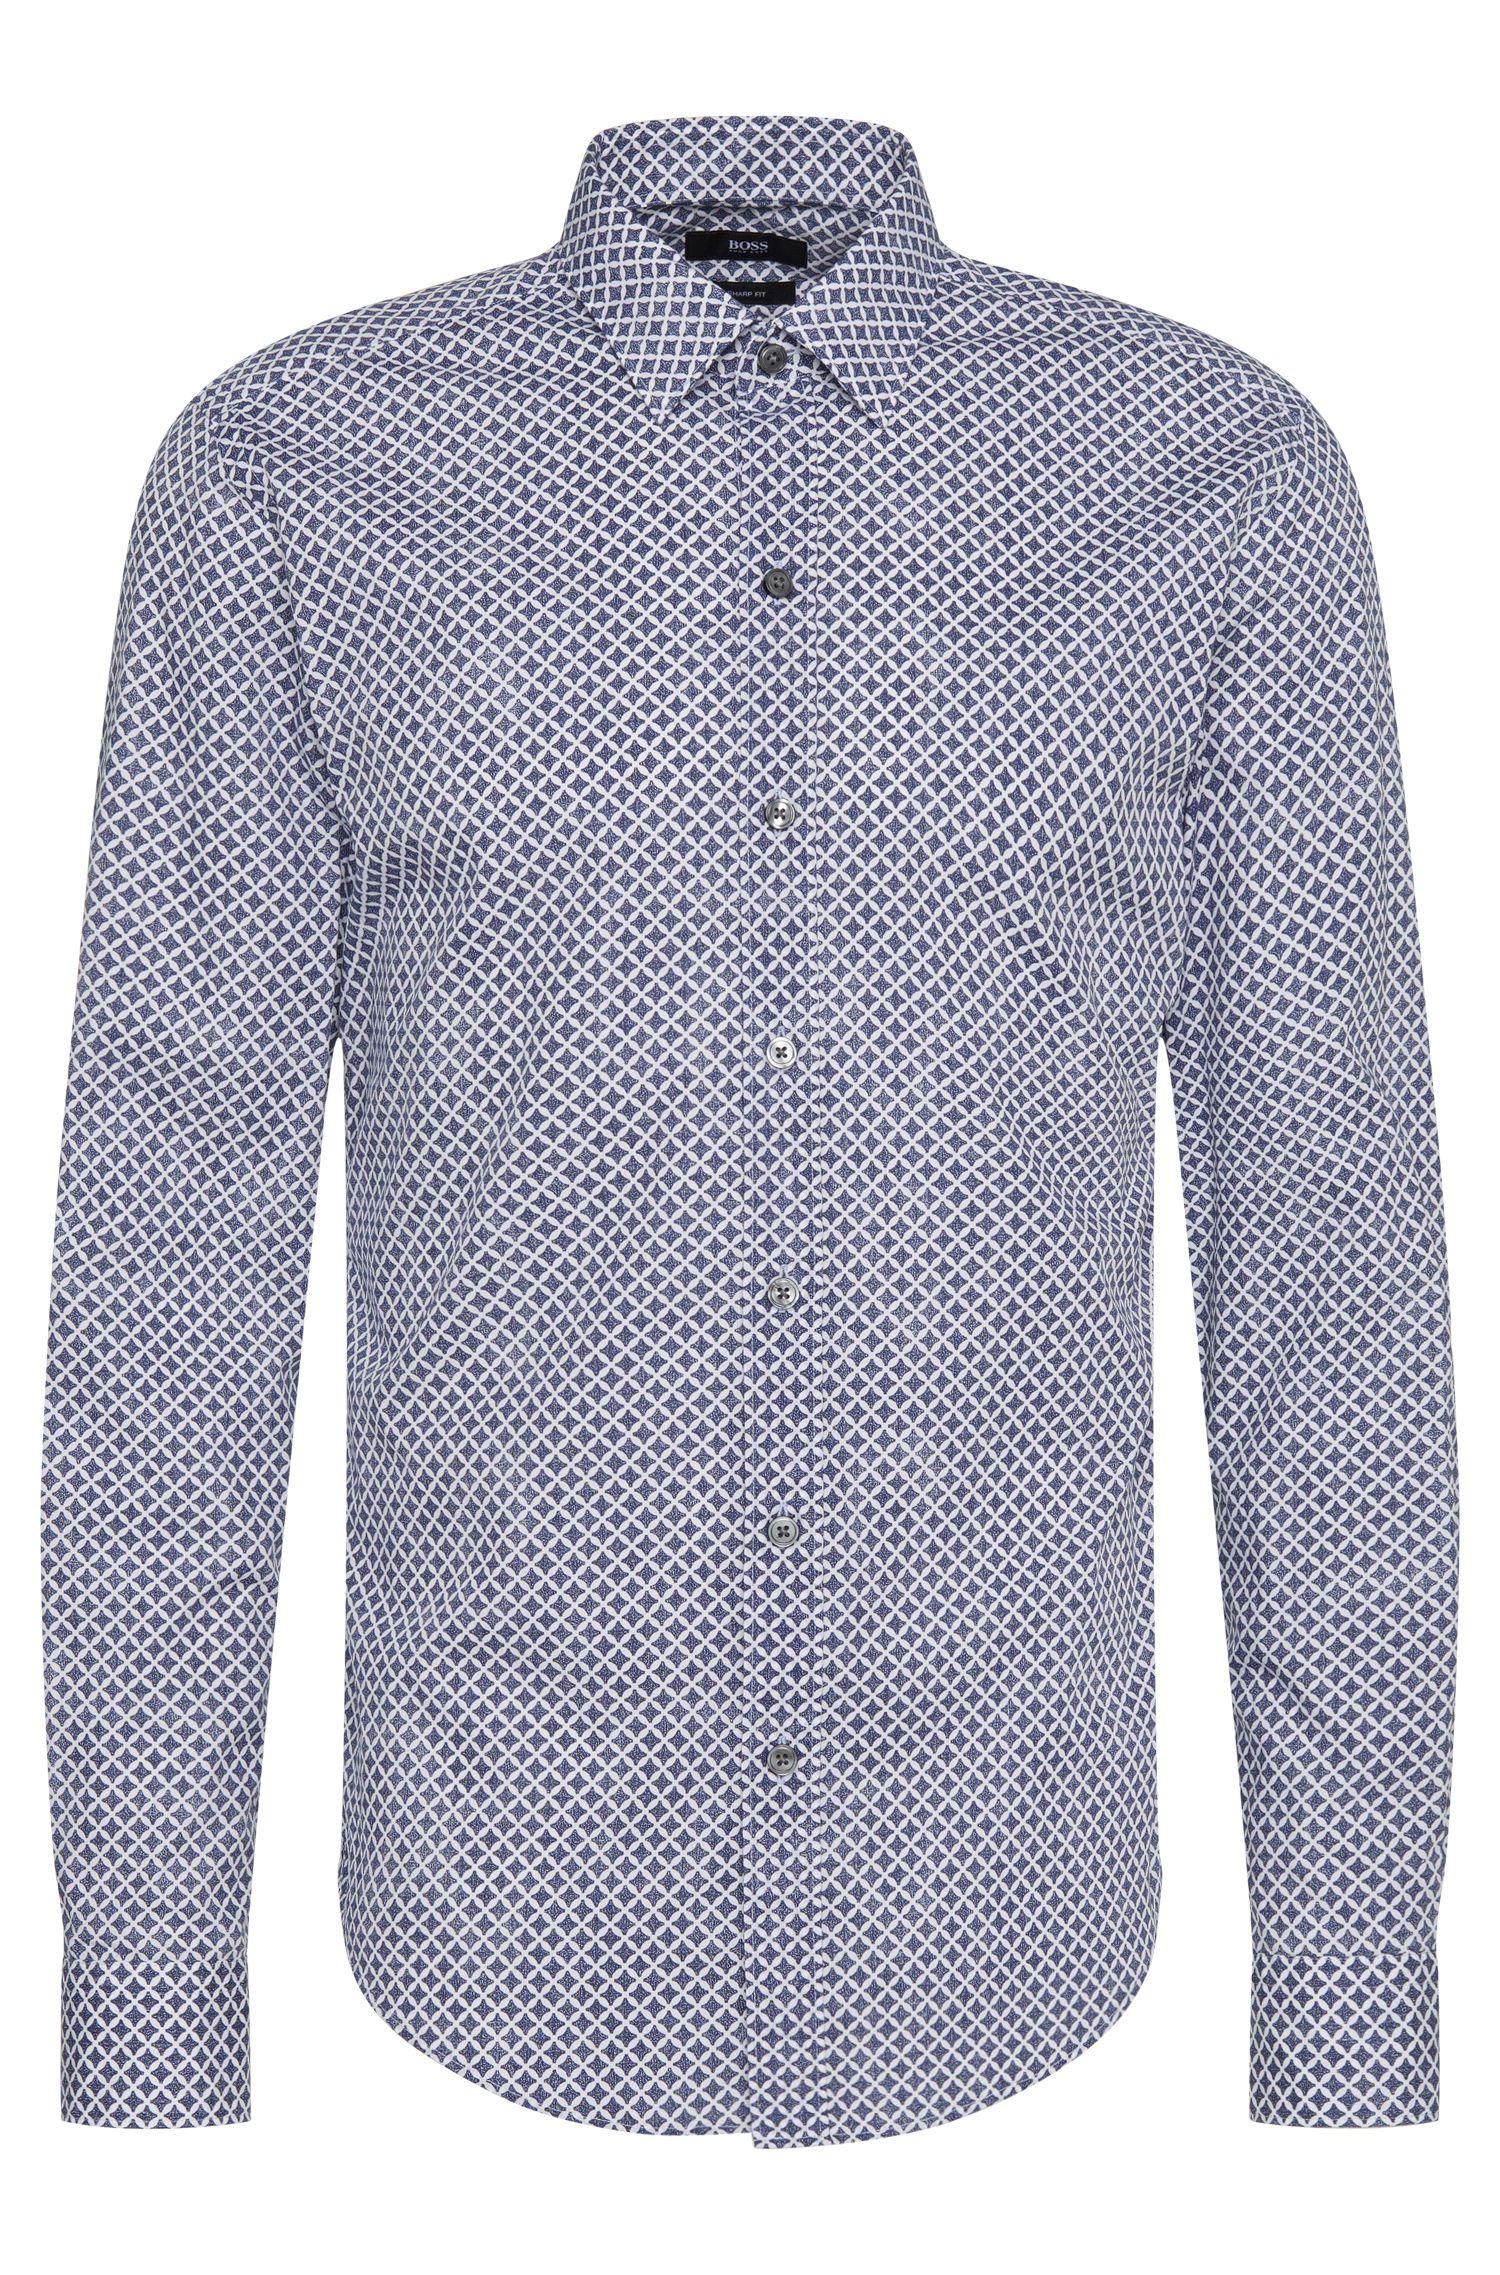 Gemustertes Slim-Fit Hemd aus reiner Baumwolle: 'Robbie'